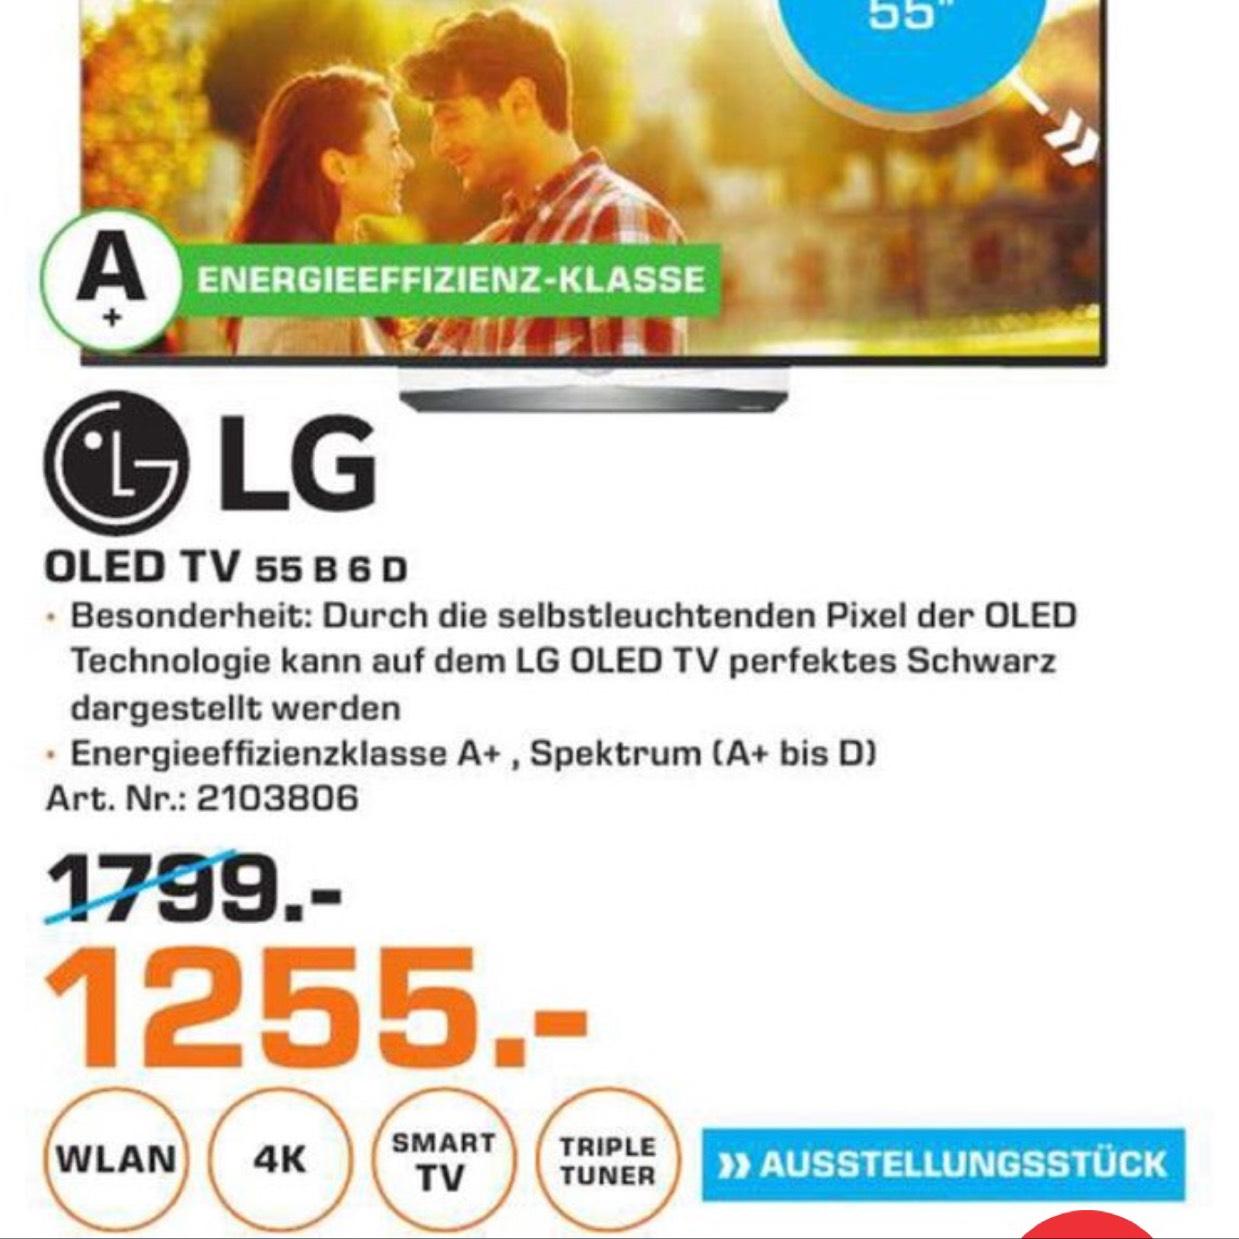 [Lokal - Saturn Bochum] LG 55B6D 1255€ (AUSSTELLER!) ... Idealo (Neugerät): 1838,90€